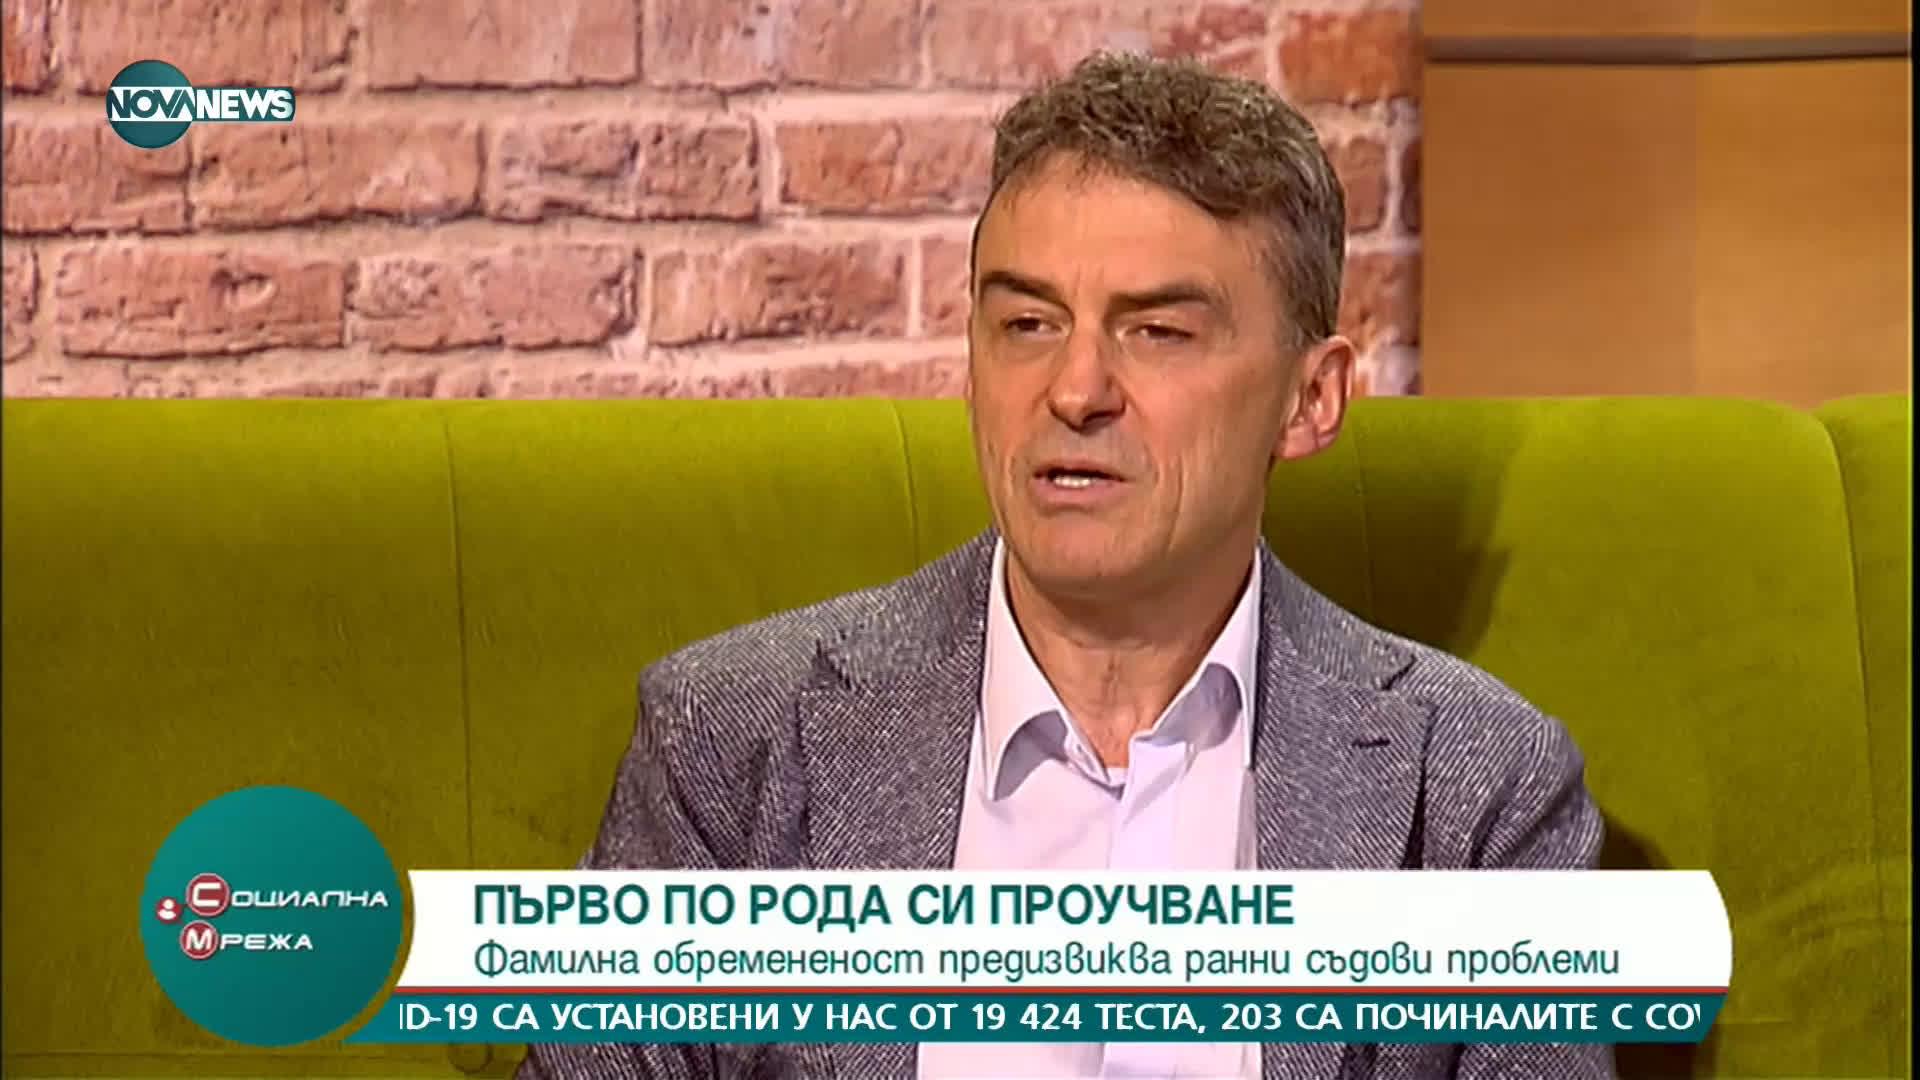 Д-р Иво Петров: Фамилна хиперхолестеролемия изостря атеросклерозата